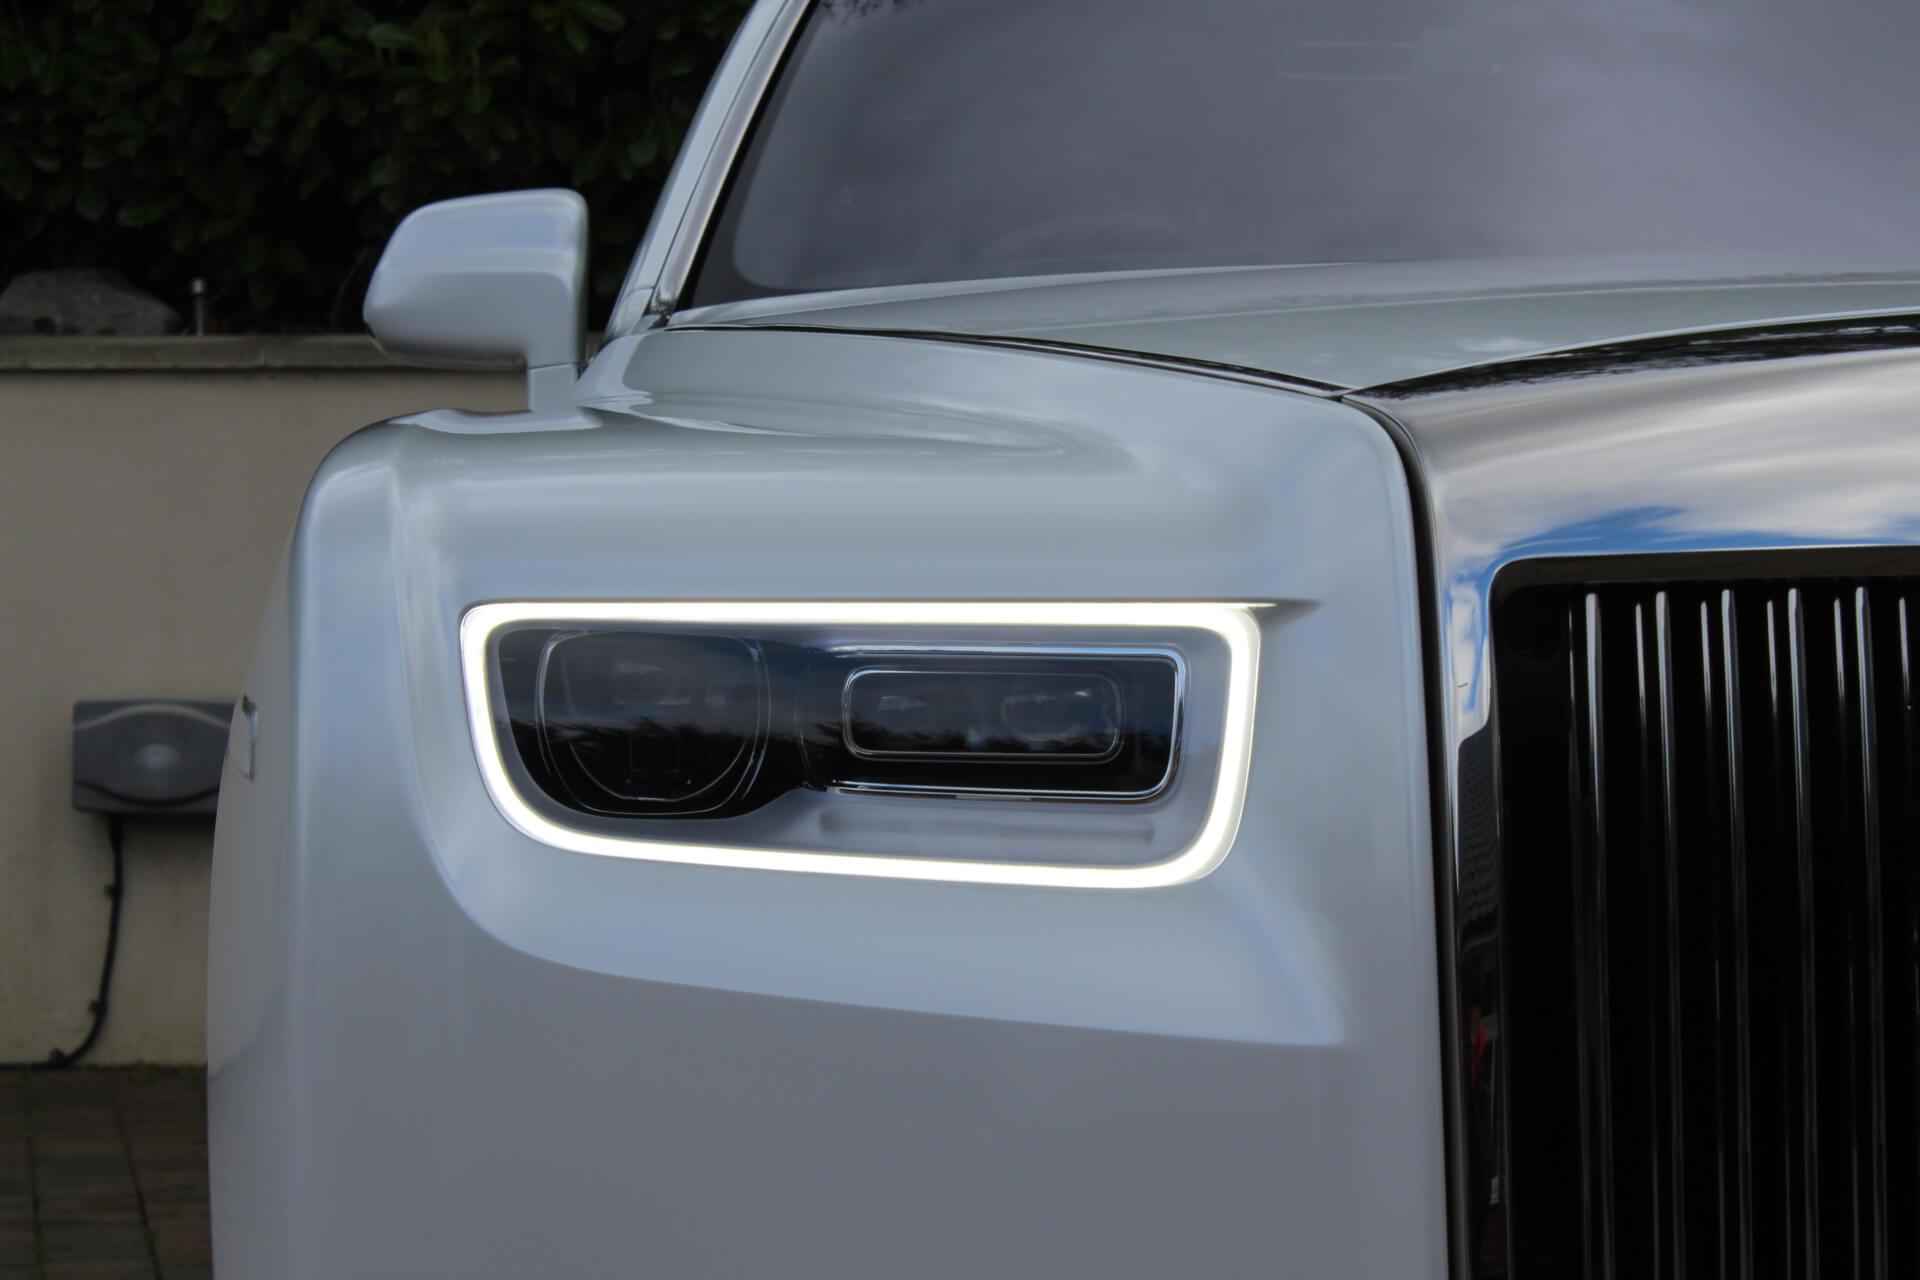 Rolls Royce Phantom 8 headlight